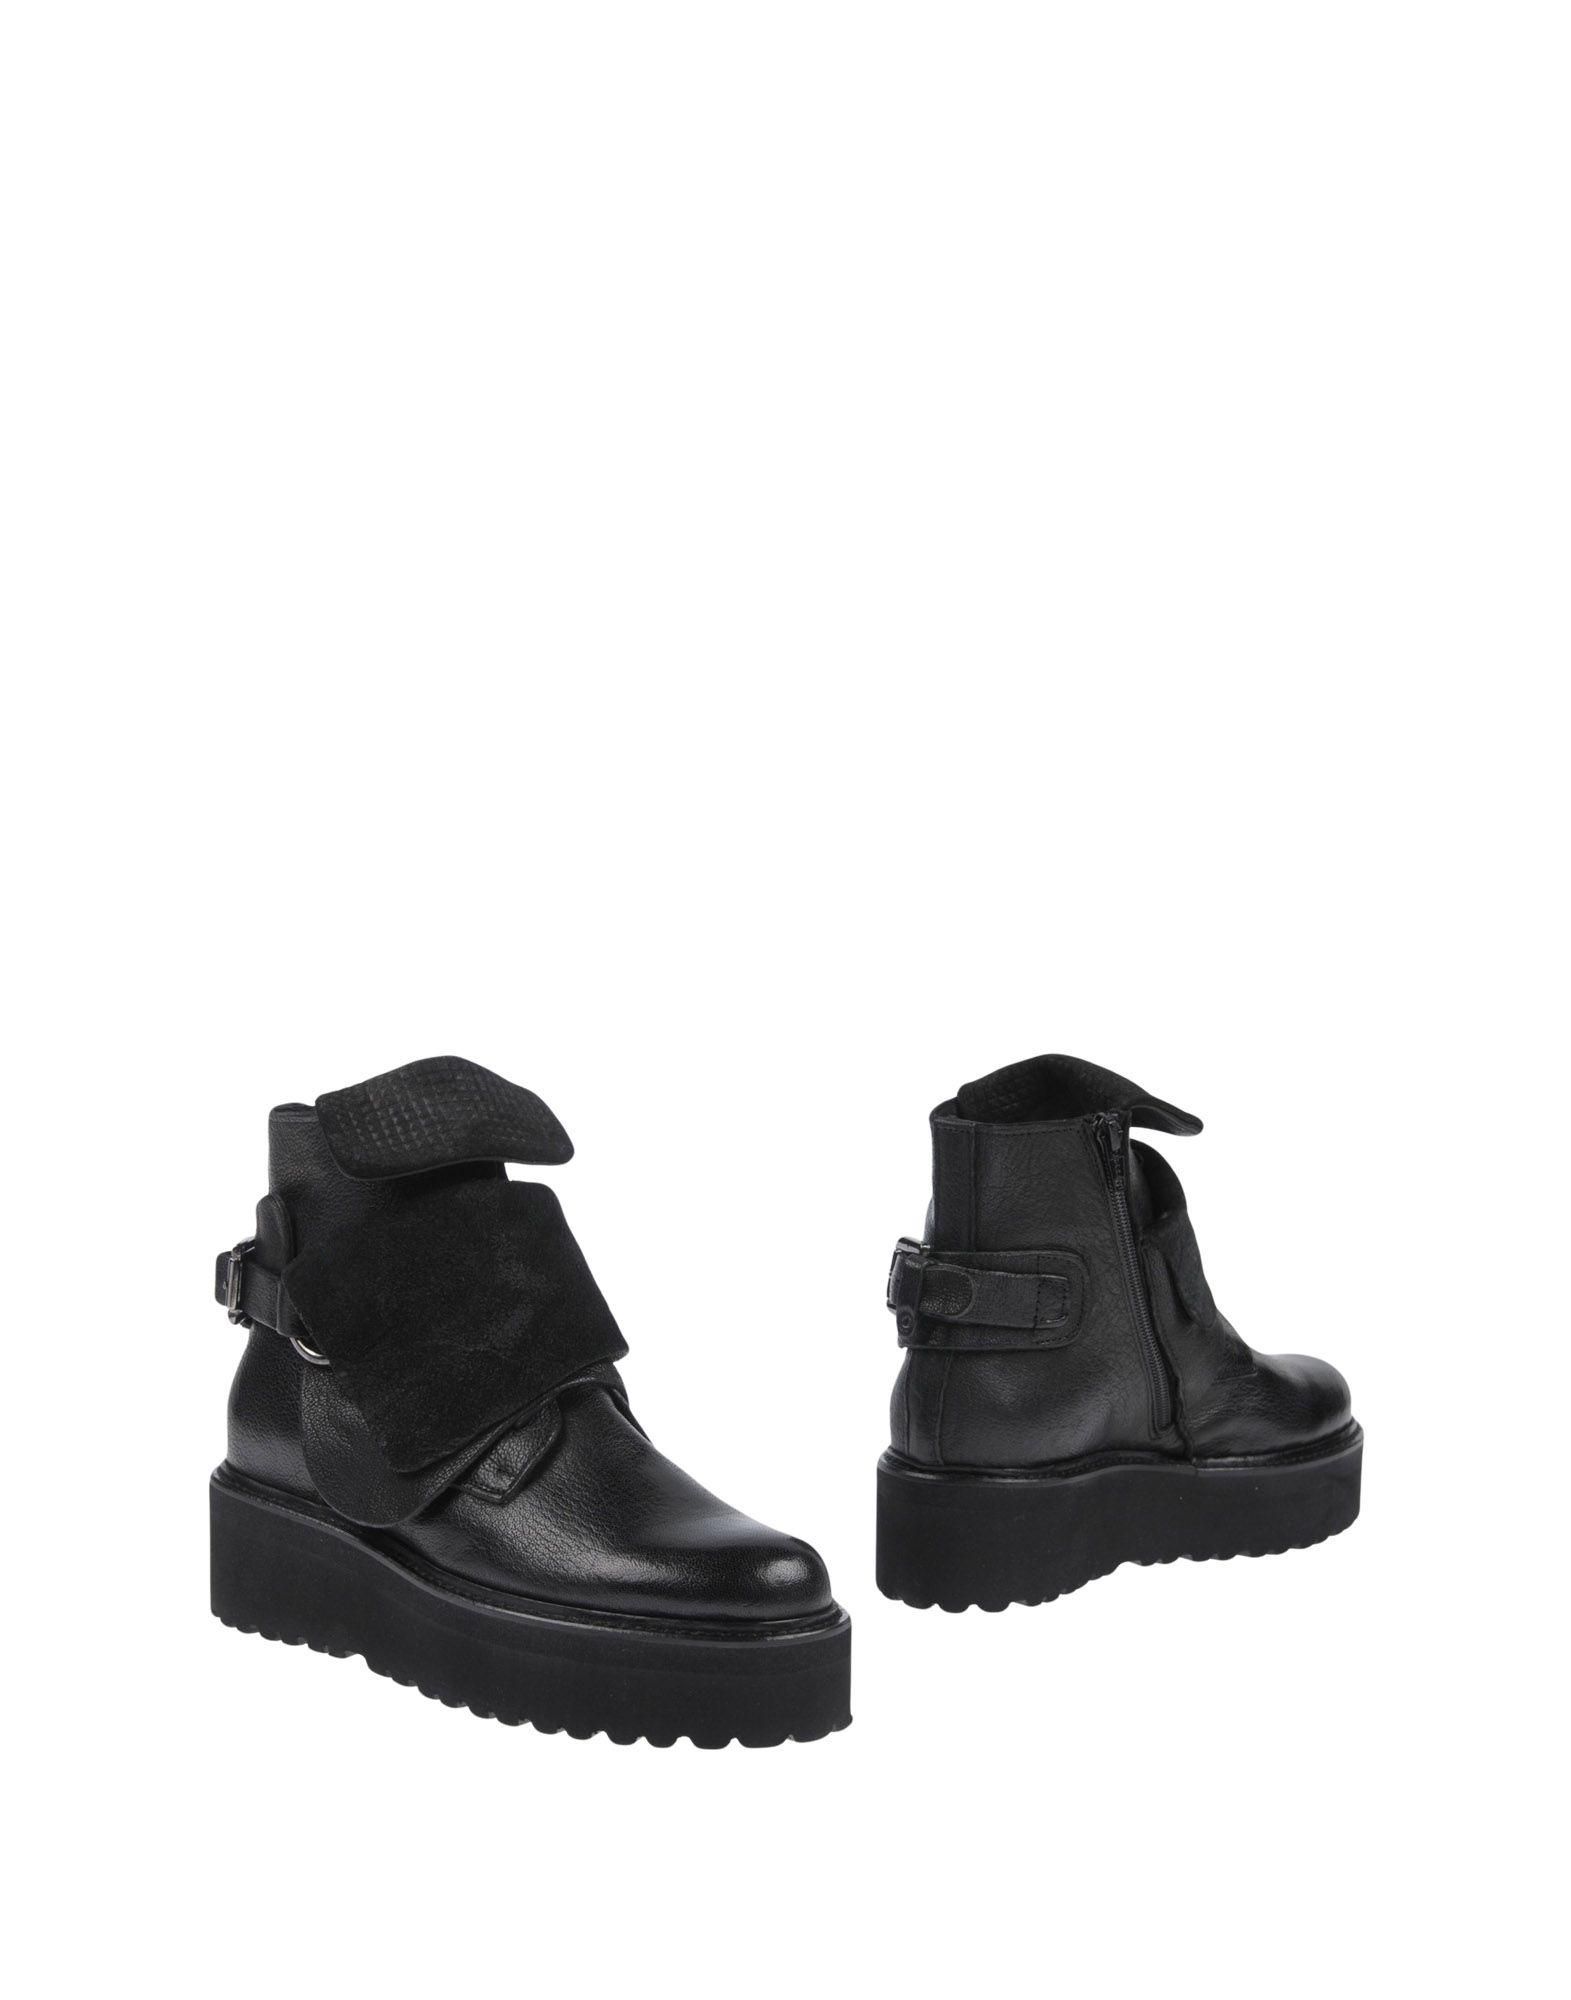 Stilvolle Damen billige Schuhe 1725.A Stiefelette Damen Stilvolle  11449911AS 30d358